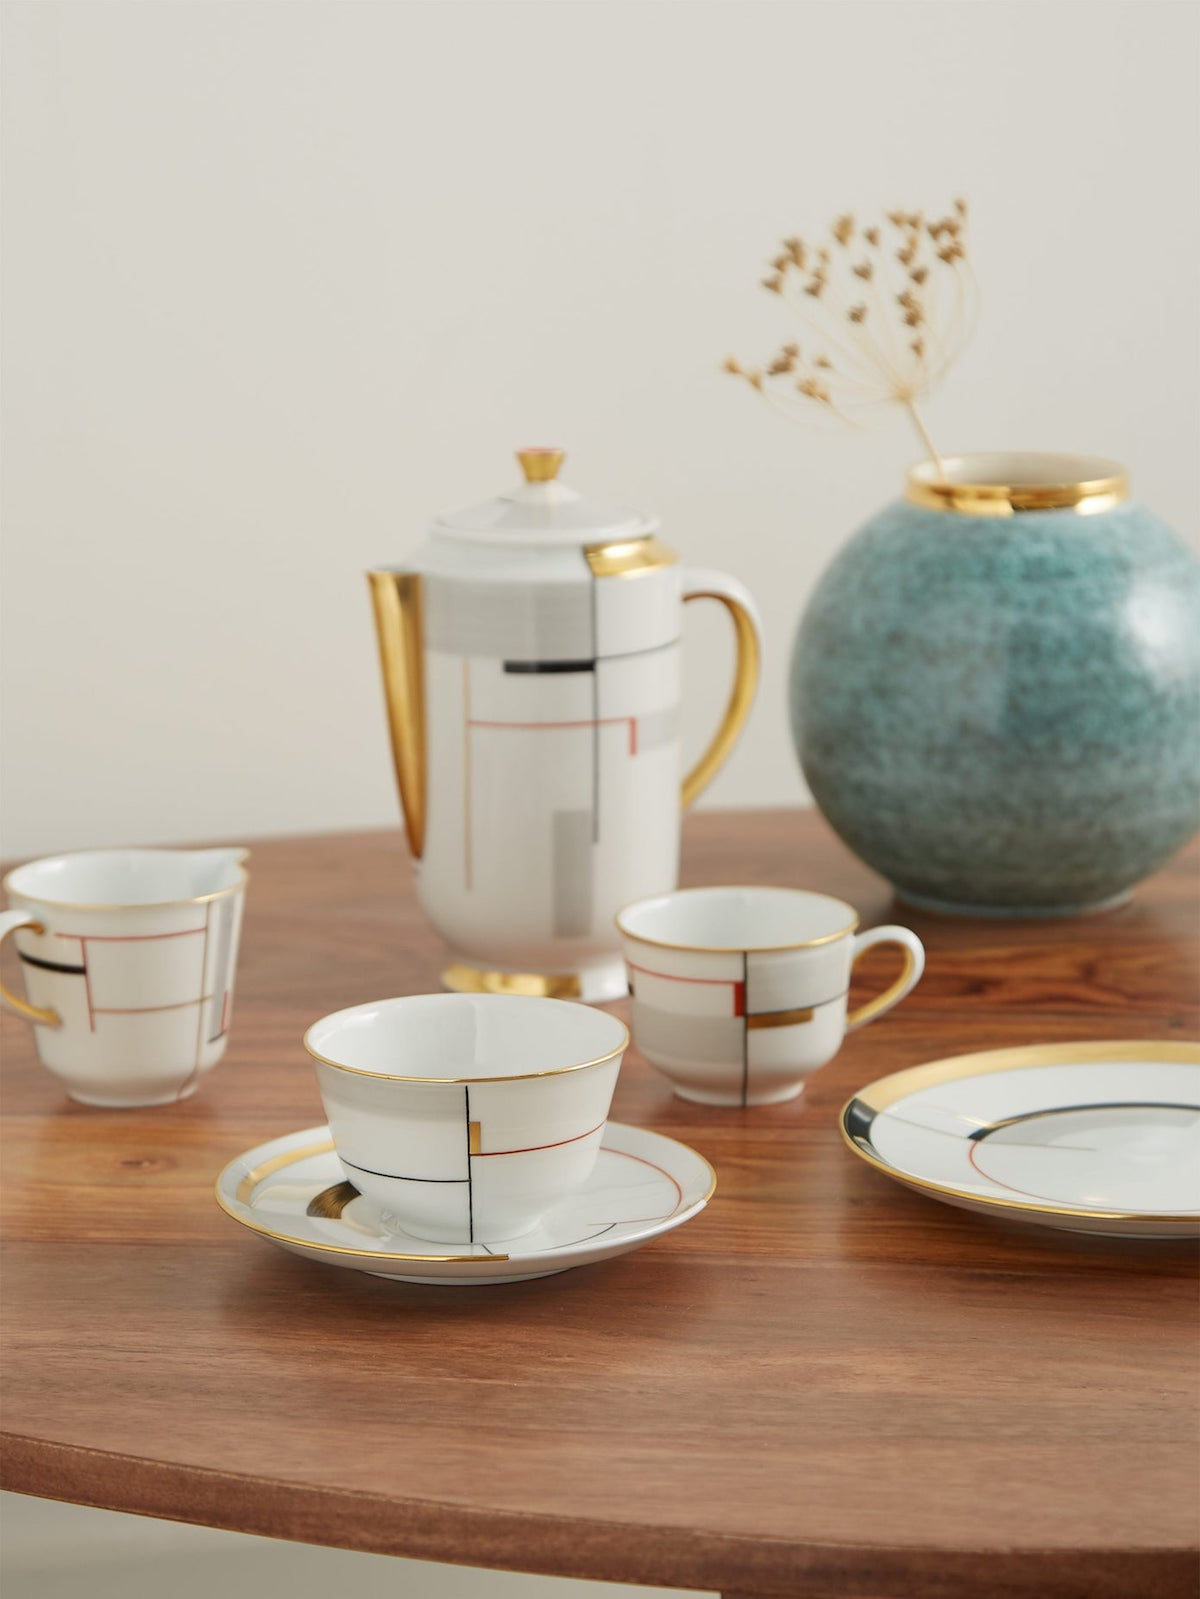 Set di Lutz Morris e KPM, con i motivi dell'insegnante del Bauhaus e ceramista Marguerite Friedlaender, in porcellana dipinta a mano